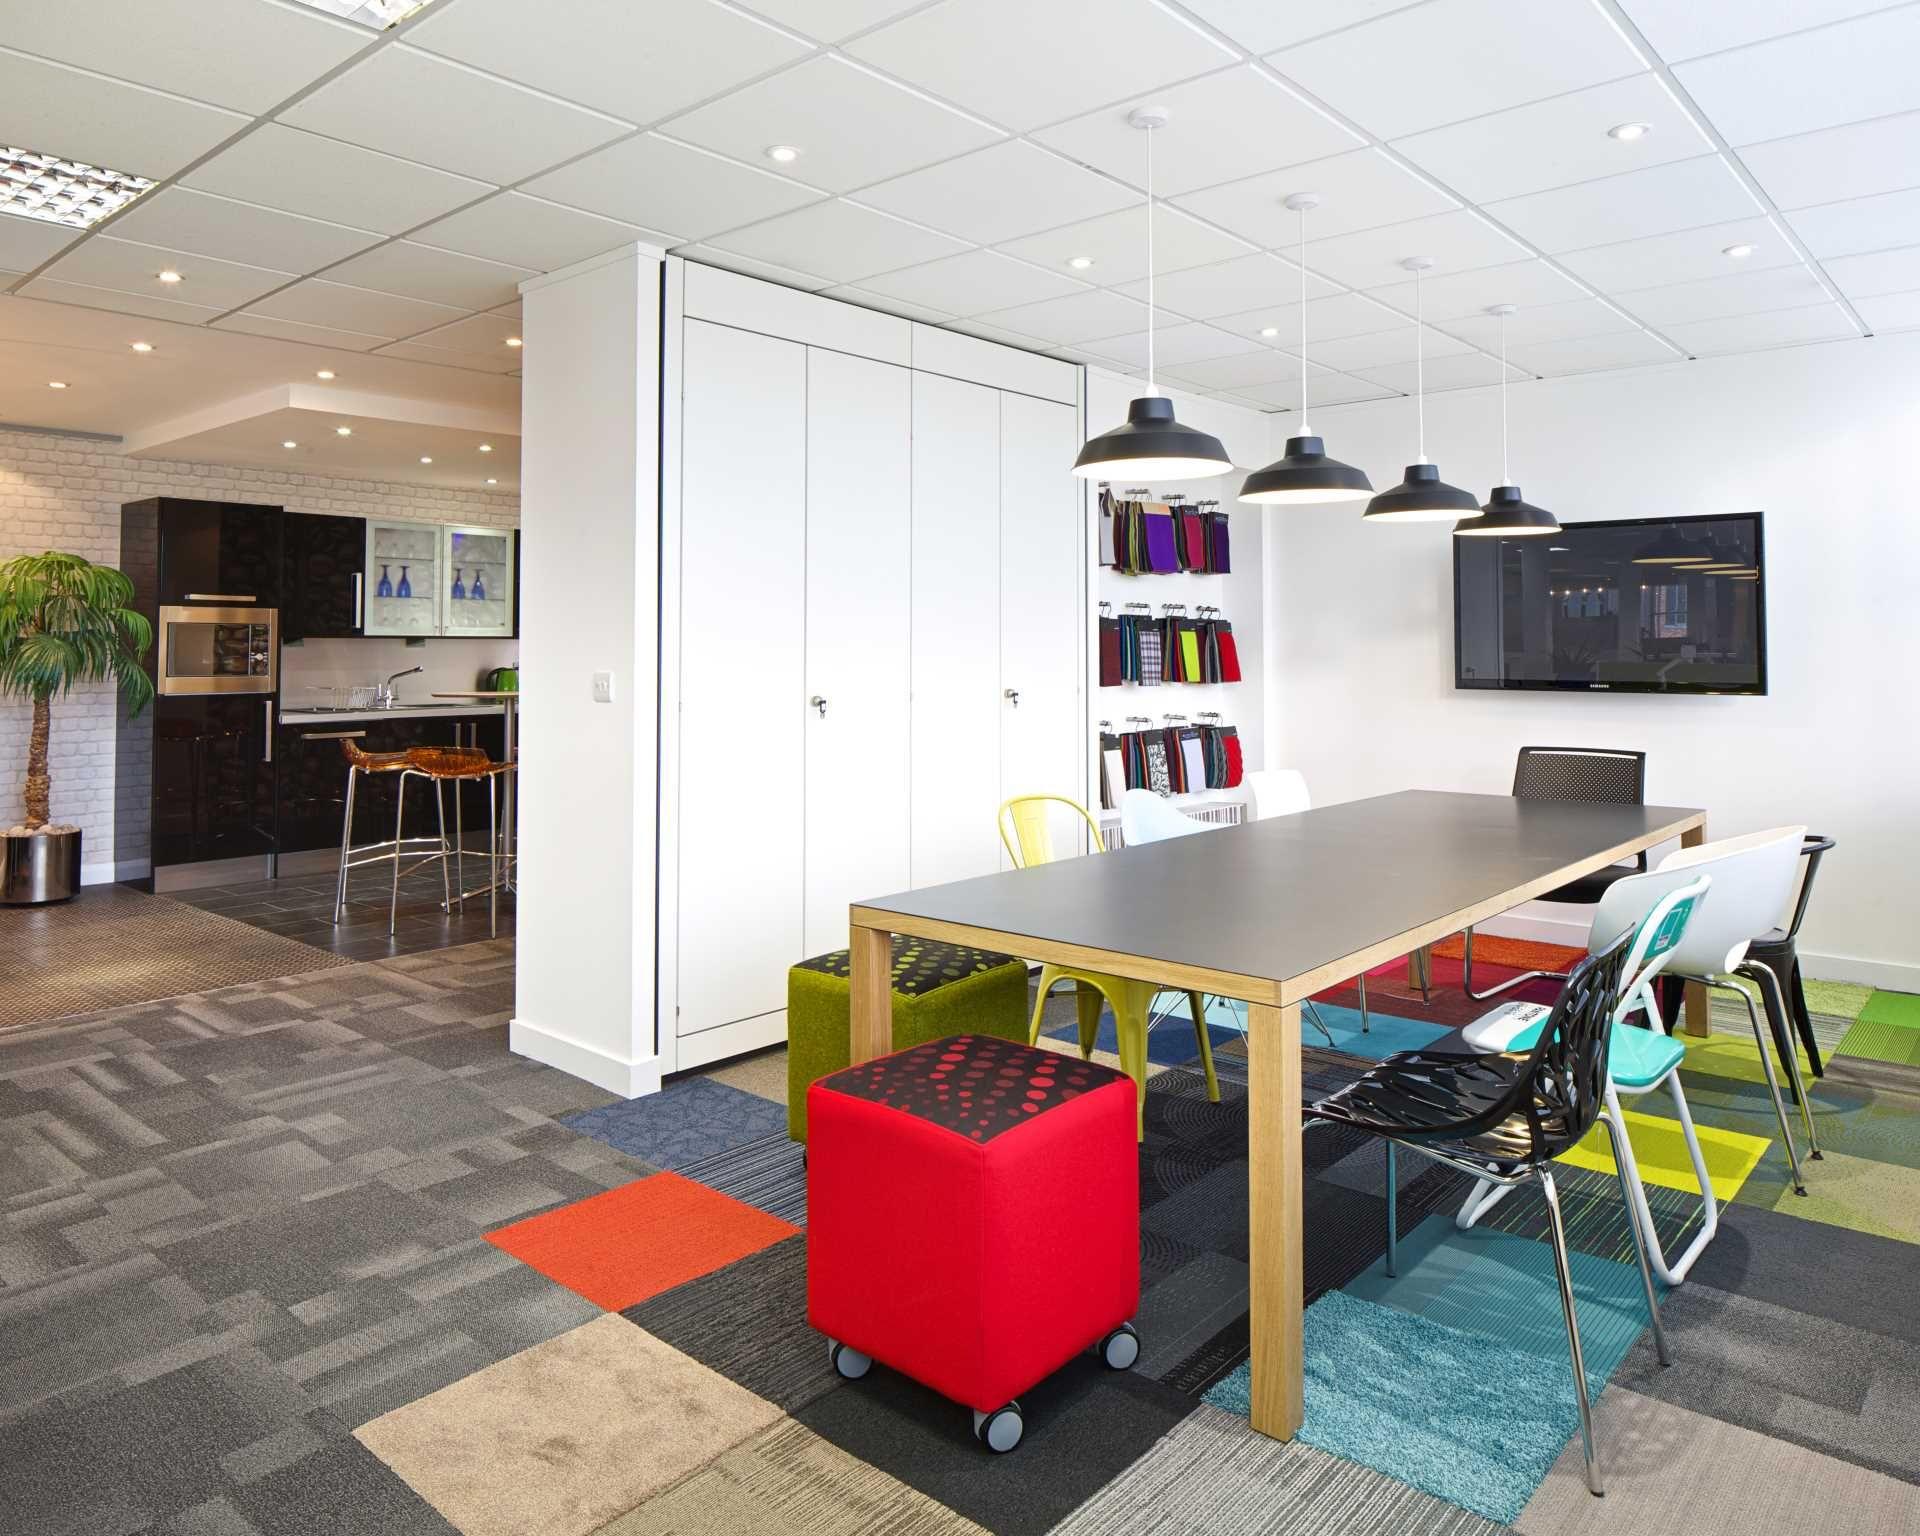 office interior design - 1000+ images about Office design on Pinterest Furniture Showroom ...